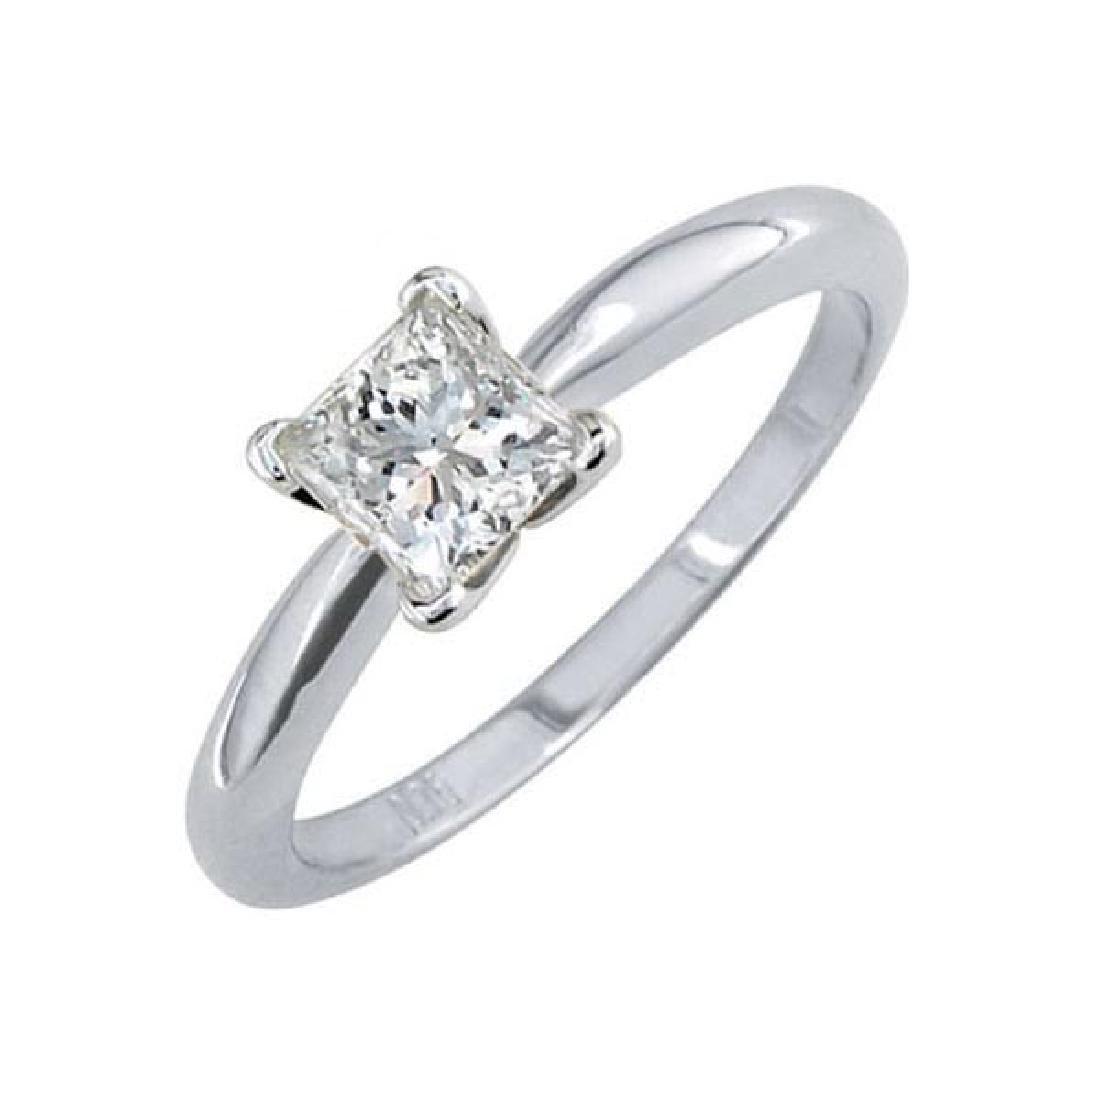 Certified 1.18 CTW Princess Diamond Solitaire 14k Ring